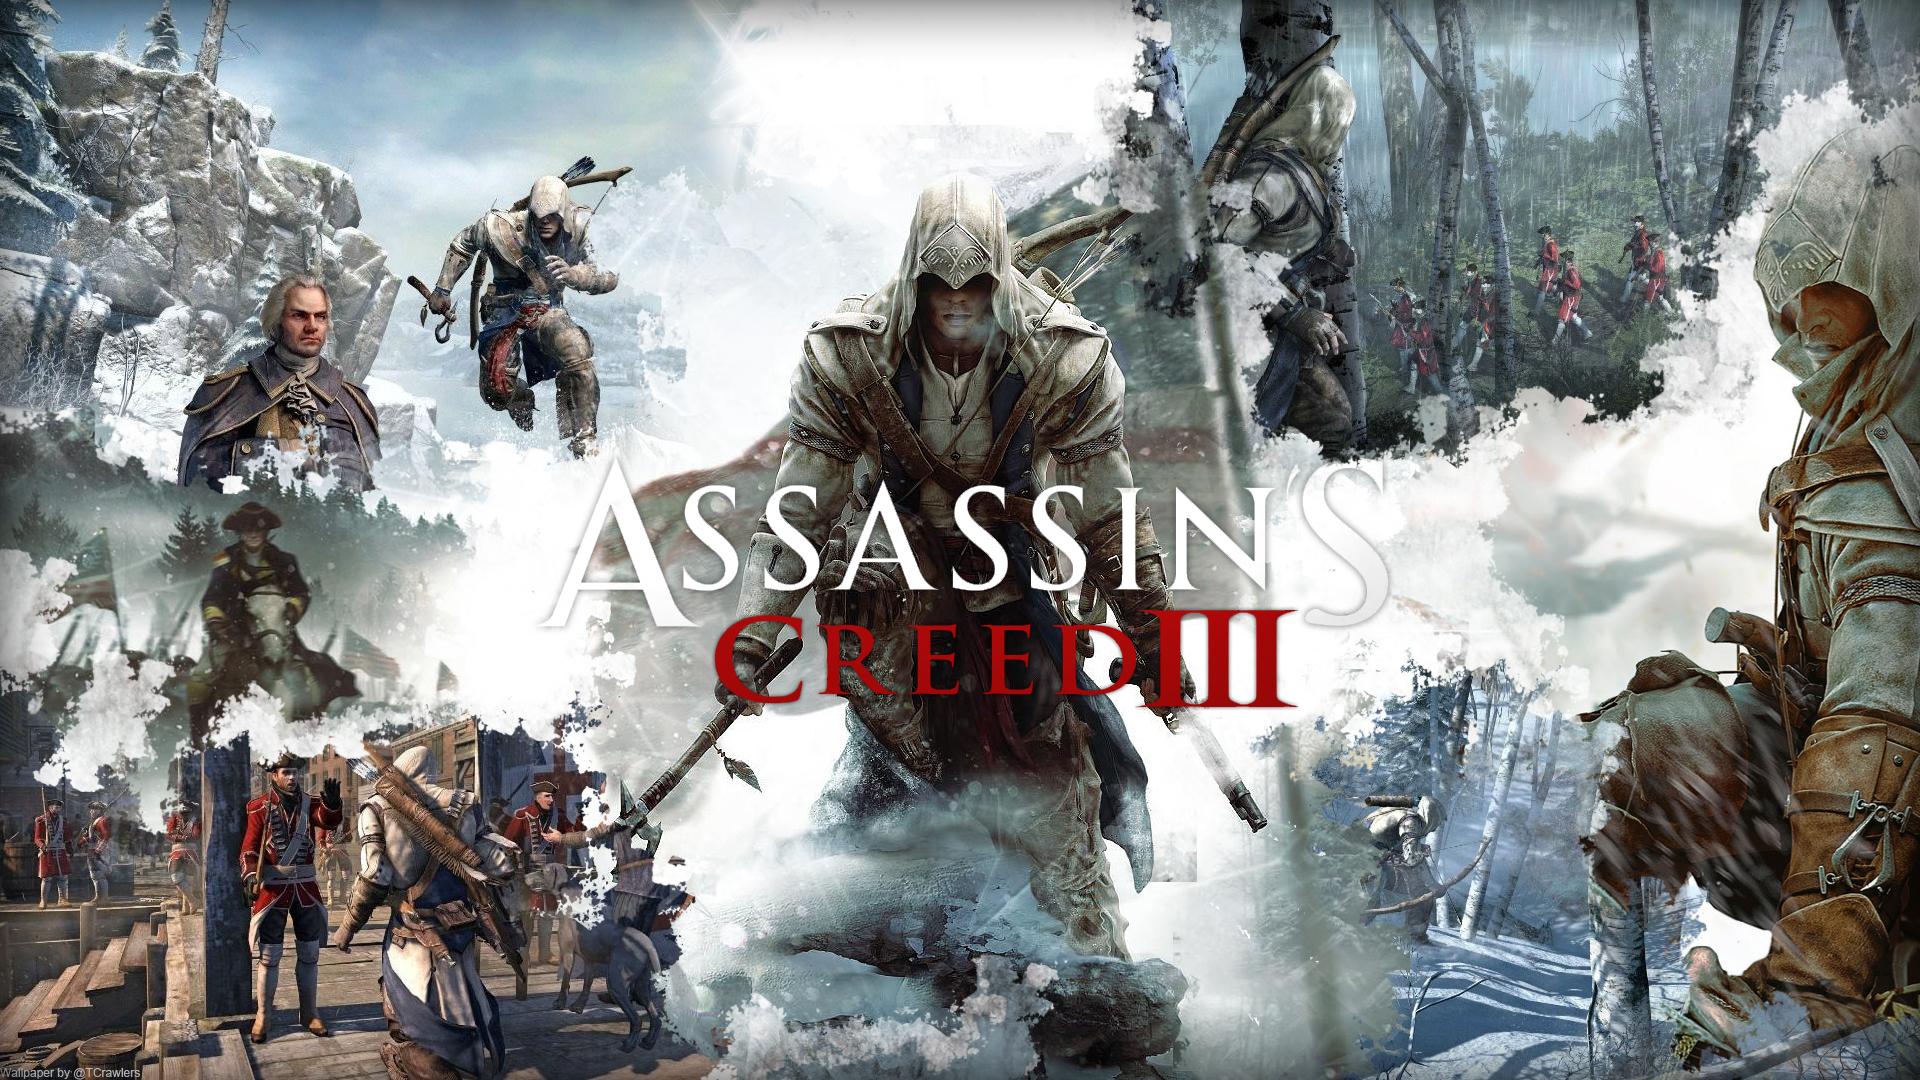 Assassins Creed 3 Assassins Creed 3 wallpapers hd hq 1080p 1920x1080